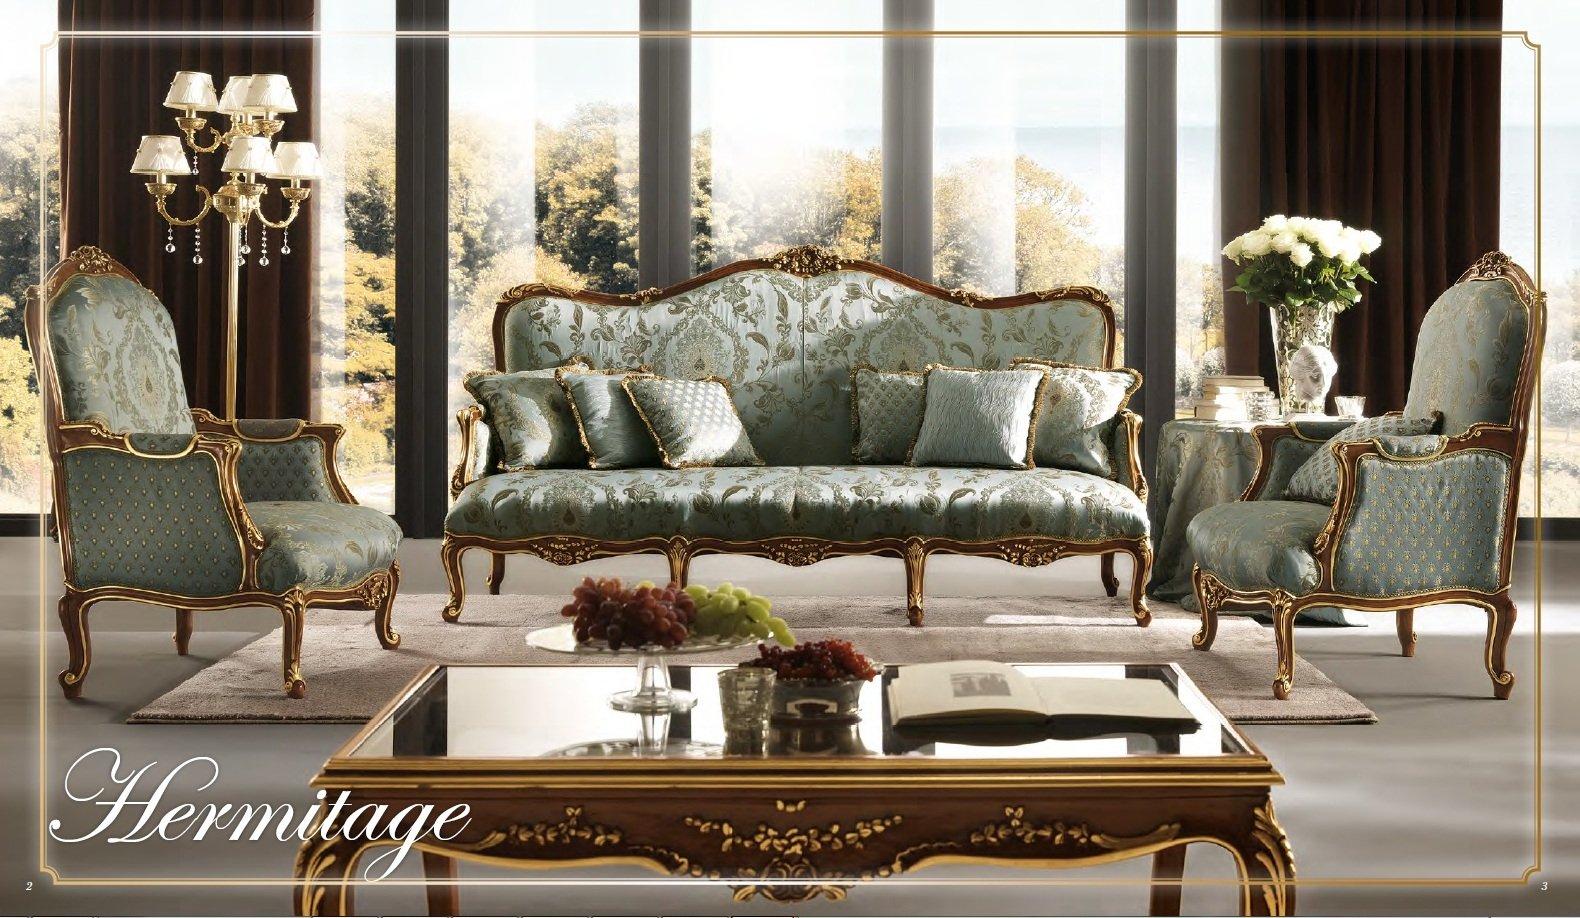 Hermitage комплект мягкой мебели 89168